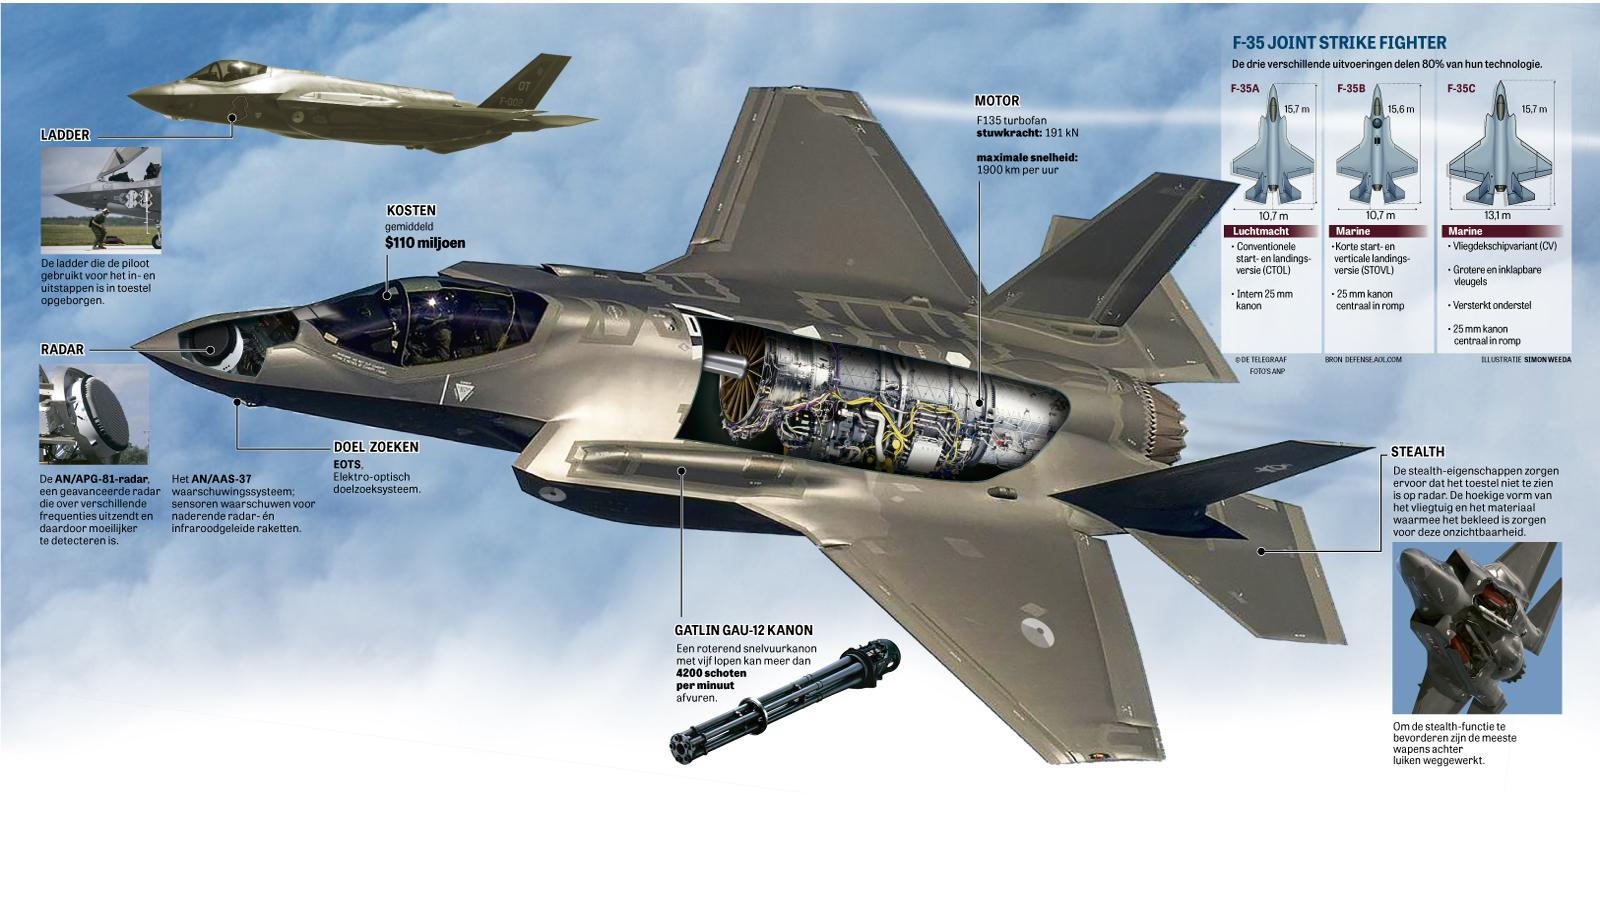 Artikelen over luchtmacht | Telegraaf.nl